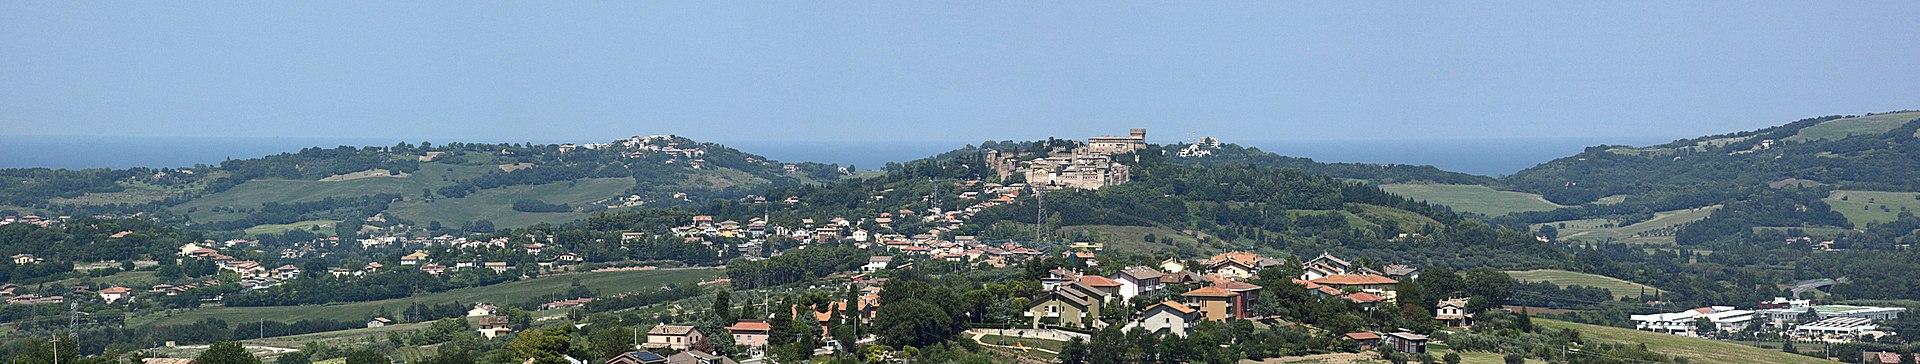 Gradara panoramica colline e mare.jpg